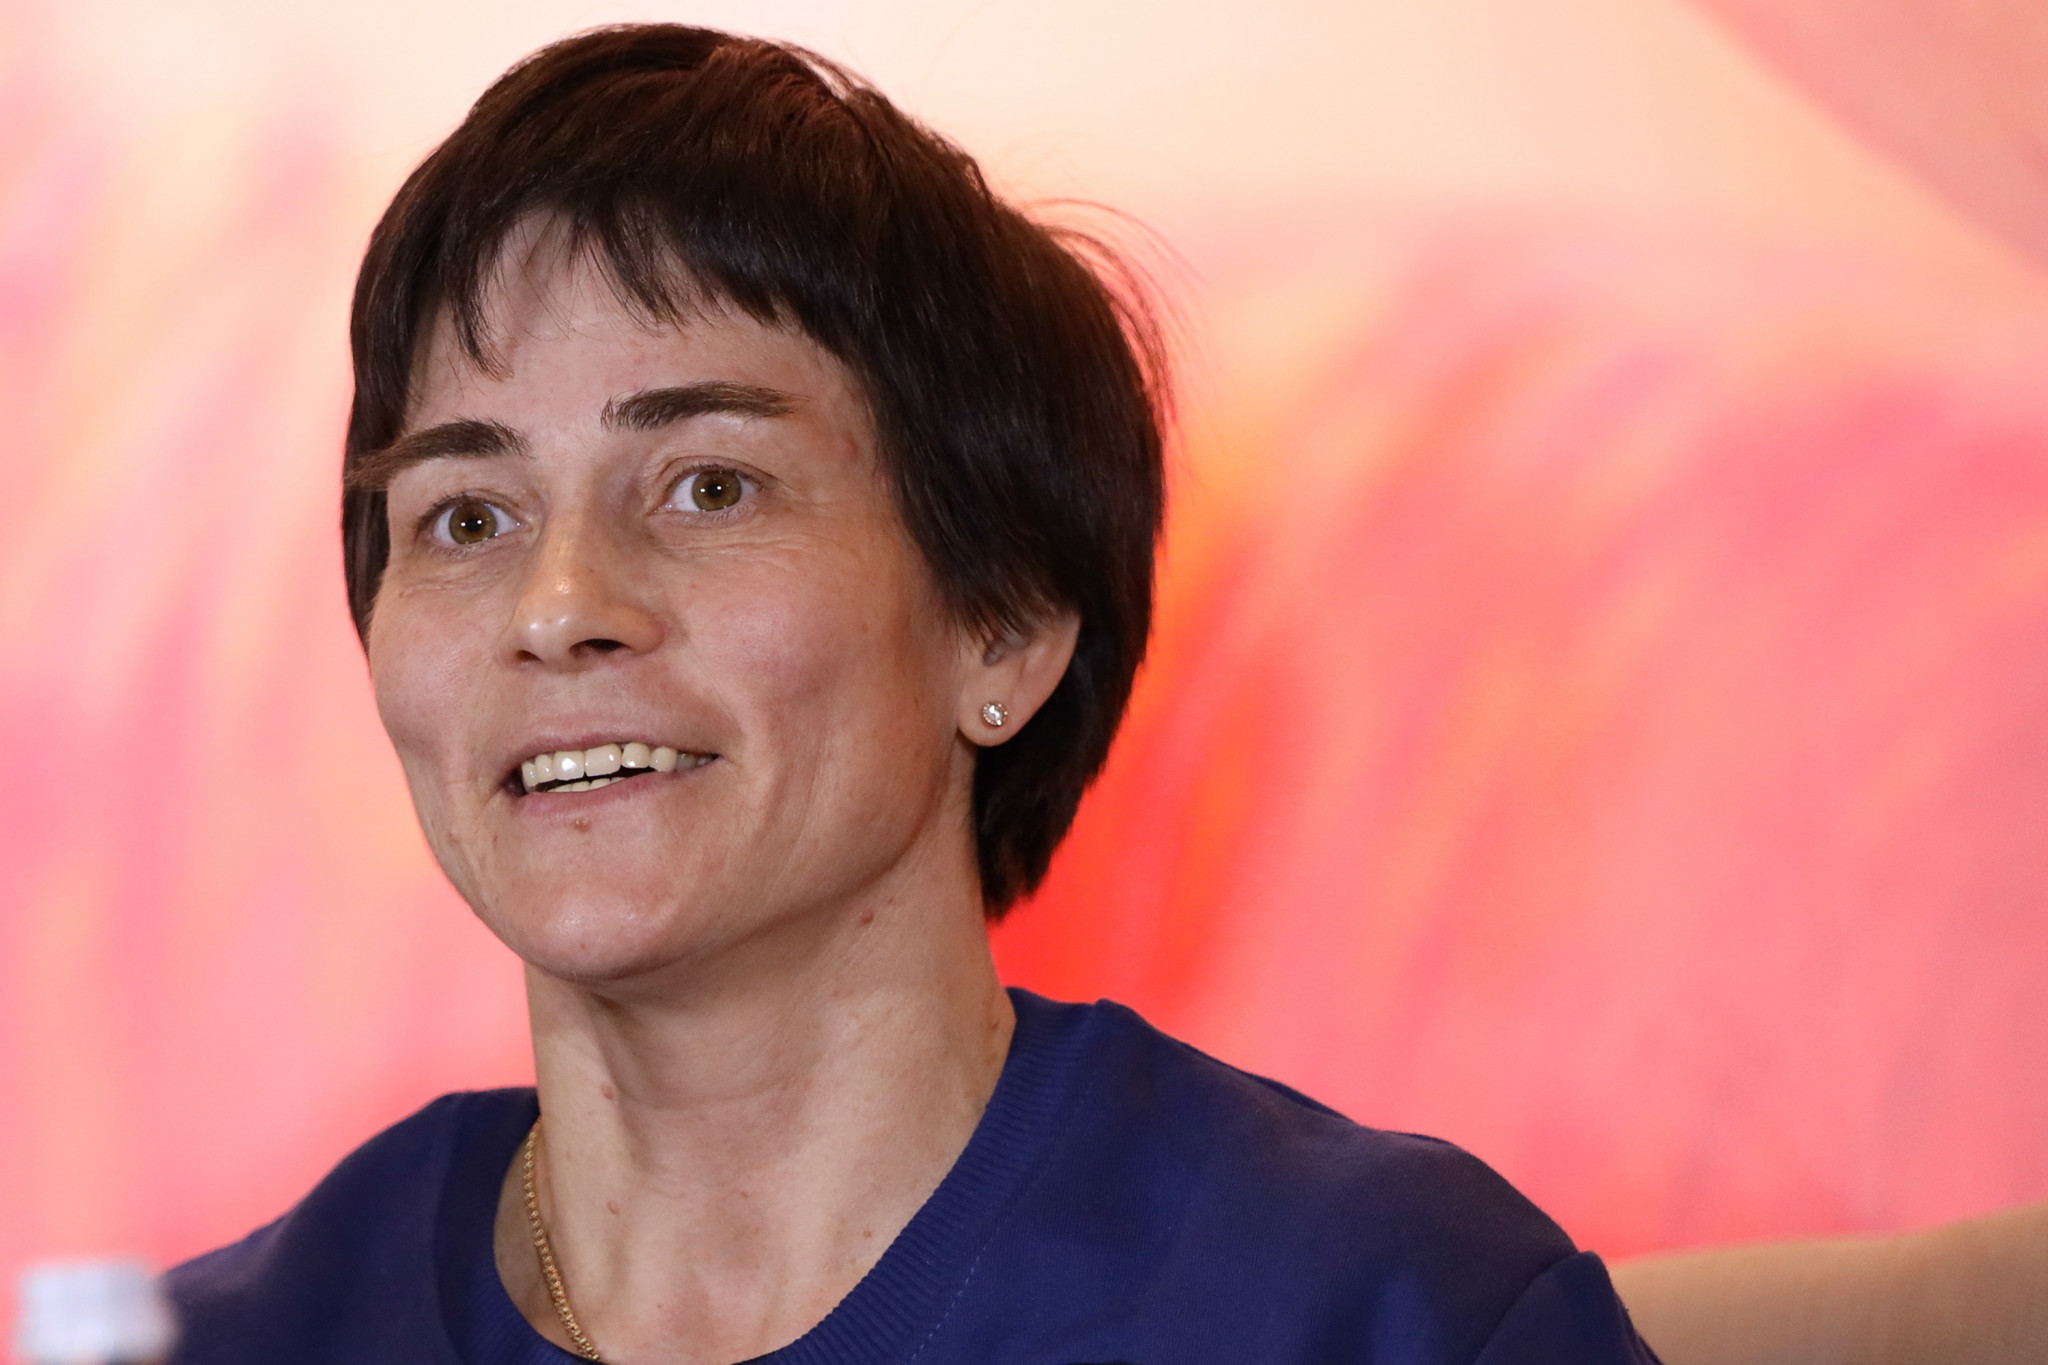 Veteran gymnast Chusovitina ends retirement again to target Asian Games medal at 47